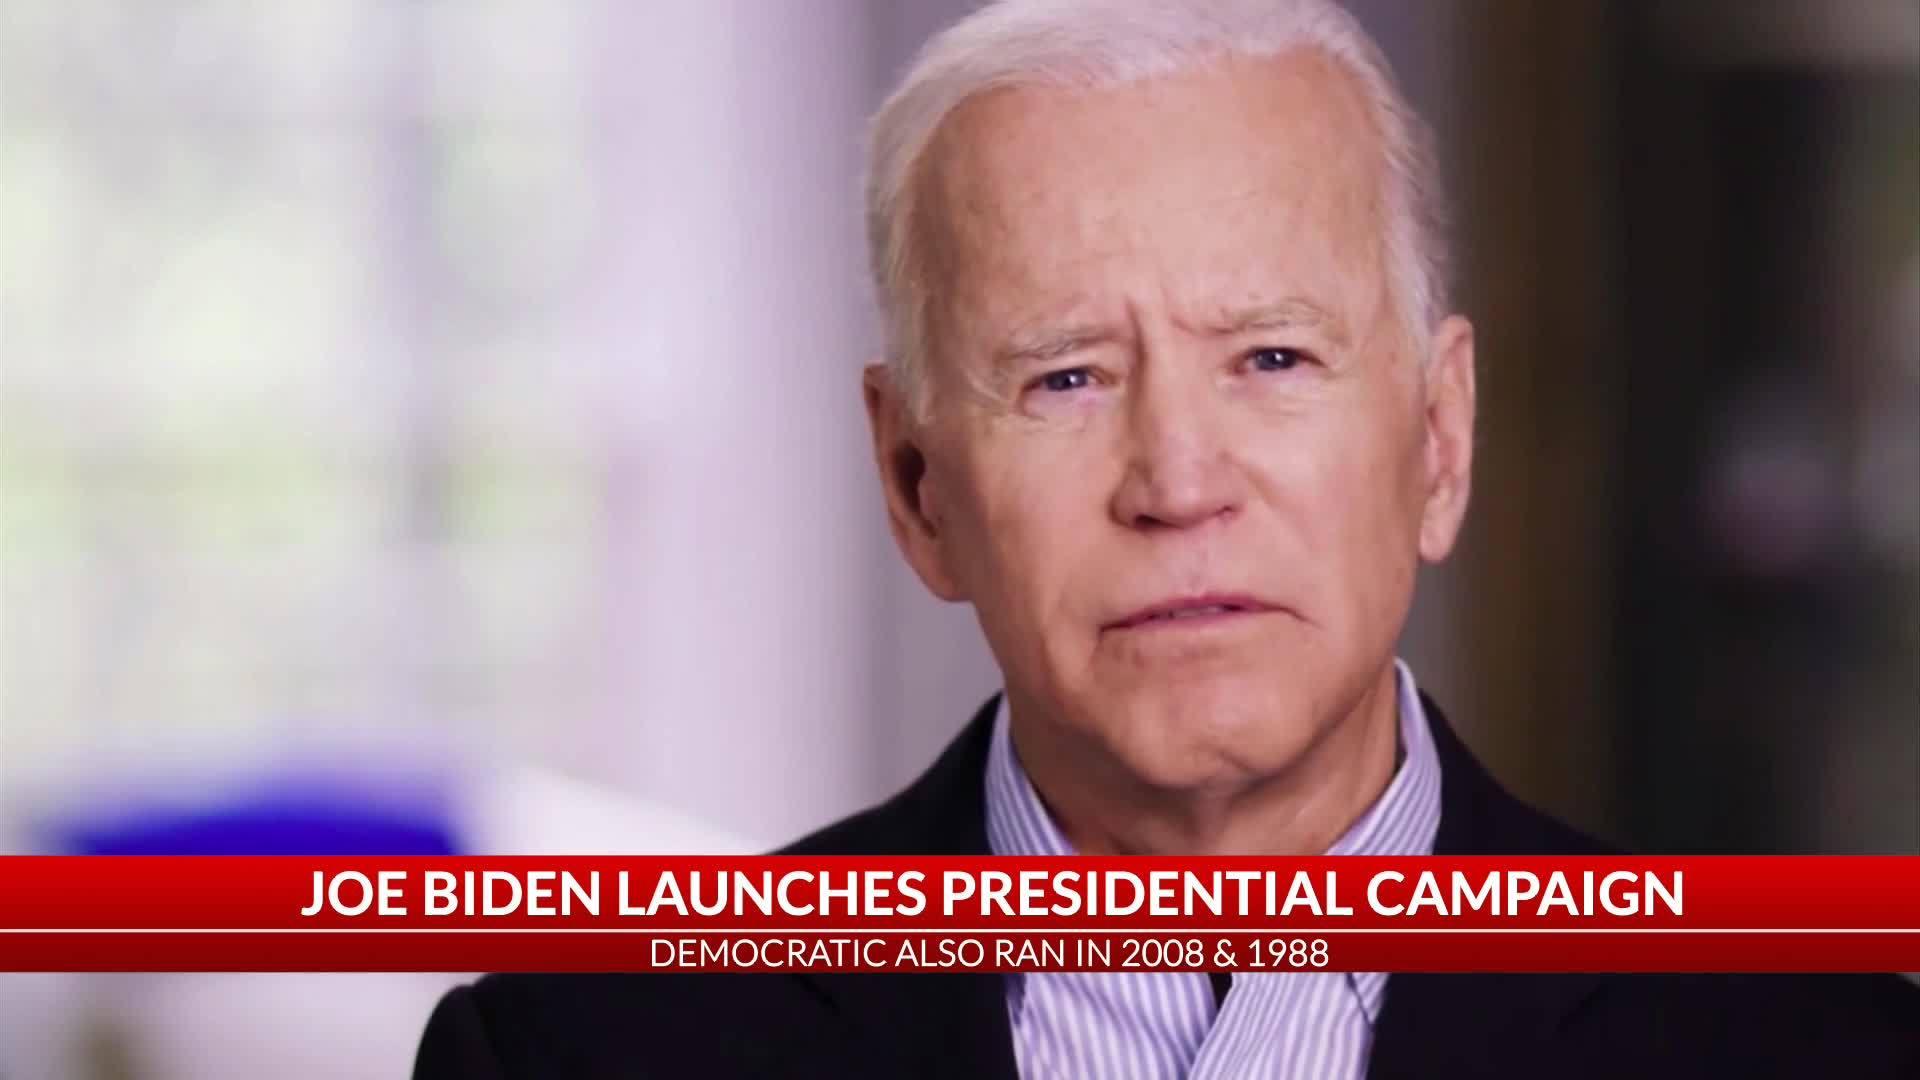 Joe_Biden_launches_presidential_campaign_8_20190425104409